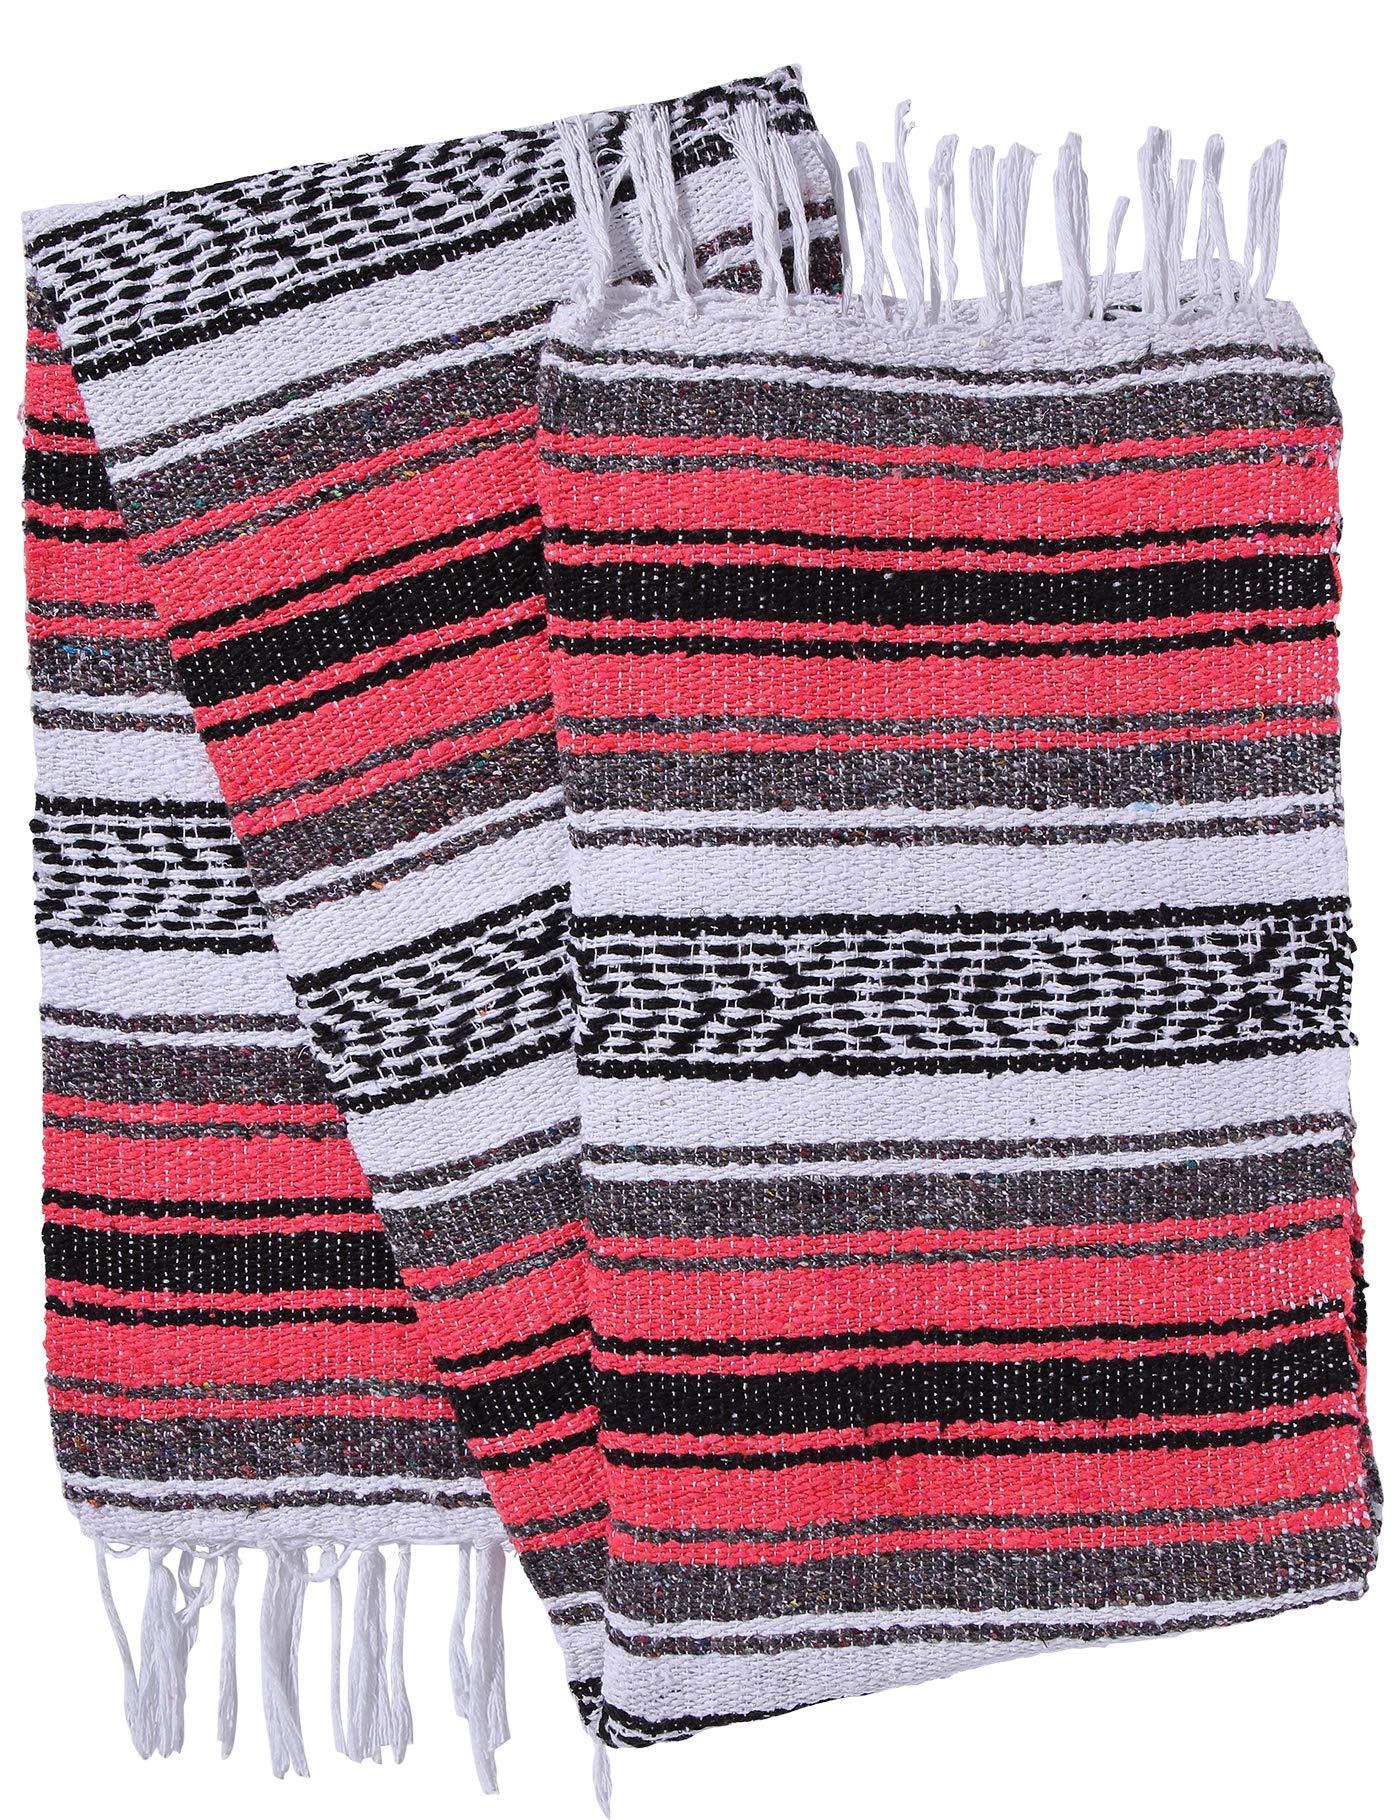 El Paso Designs Genuine Mexican Falsa Blanket - Yoga Studio Blanket, Colorful, Soft Woven Serape Imported from Mexico (Bright Coral) by El Paso Designs (Image #3)